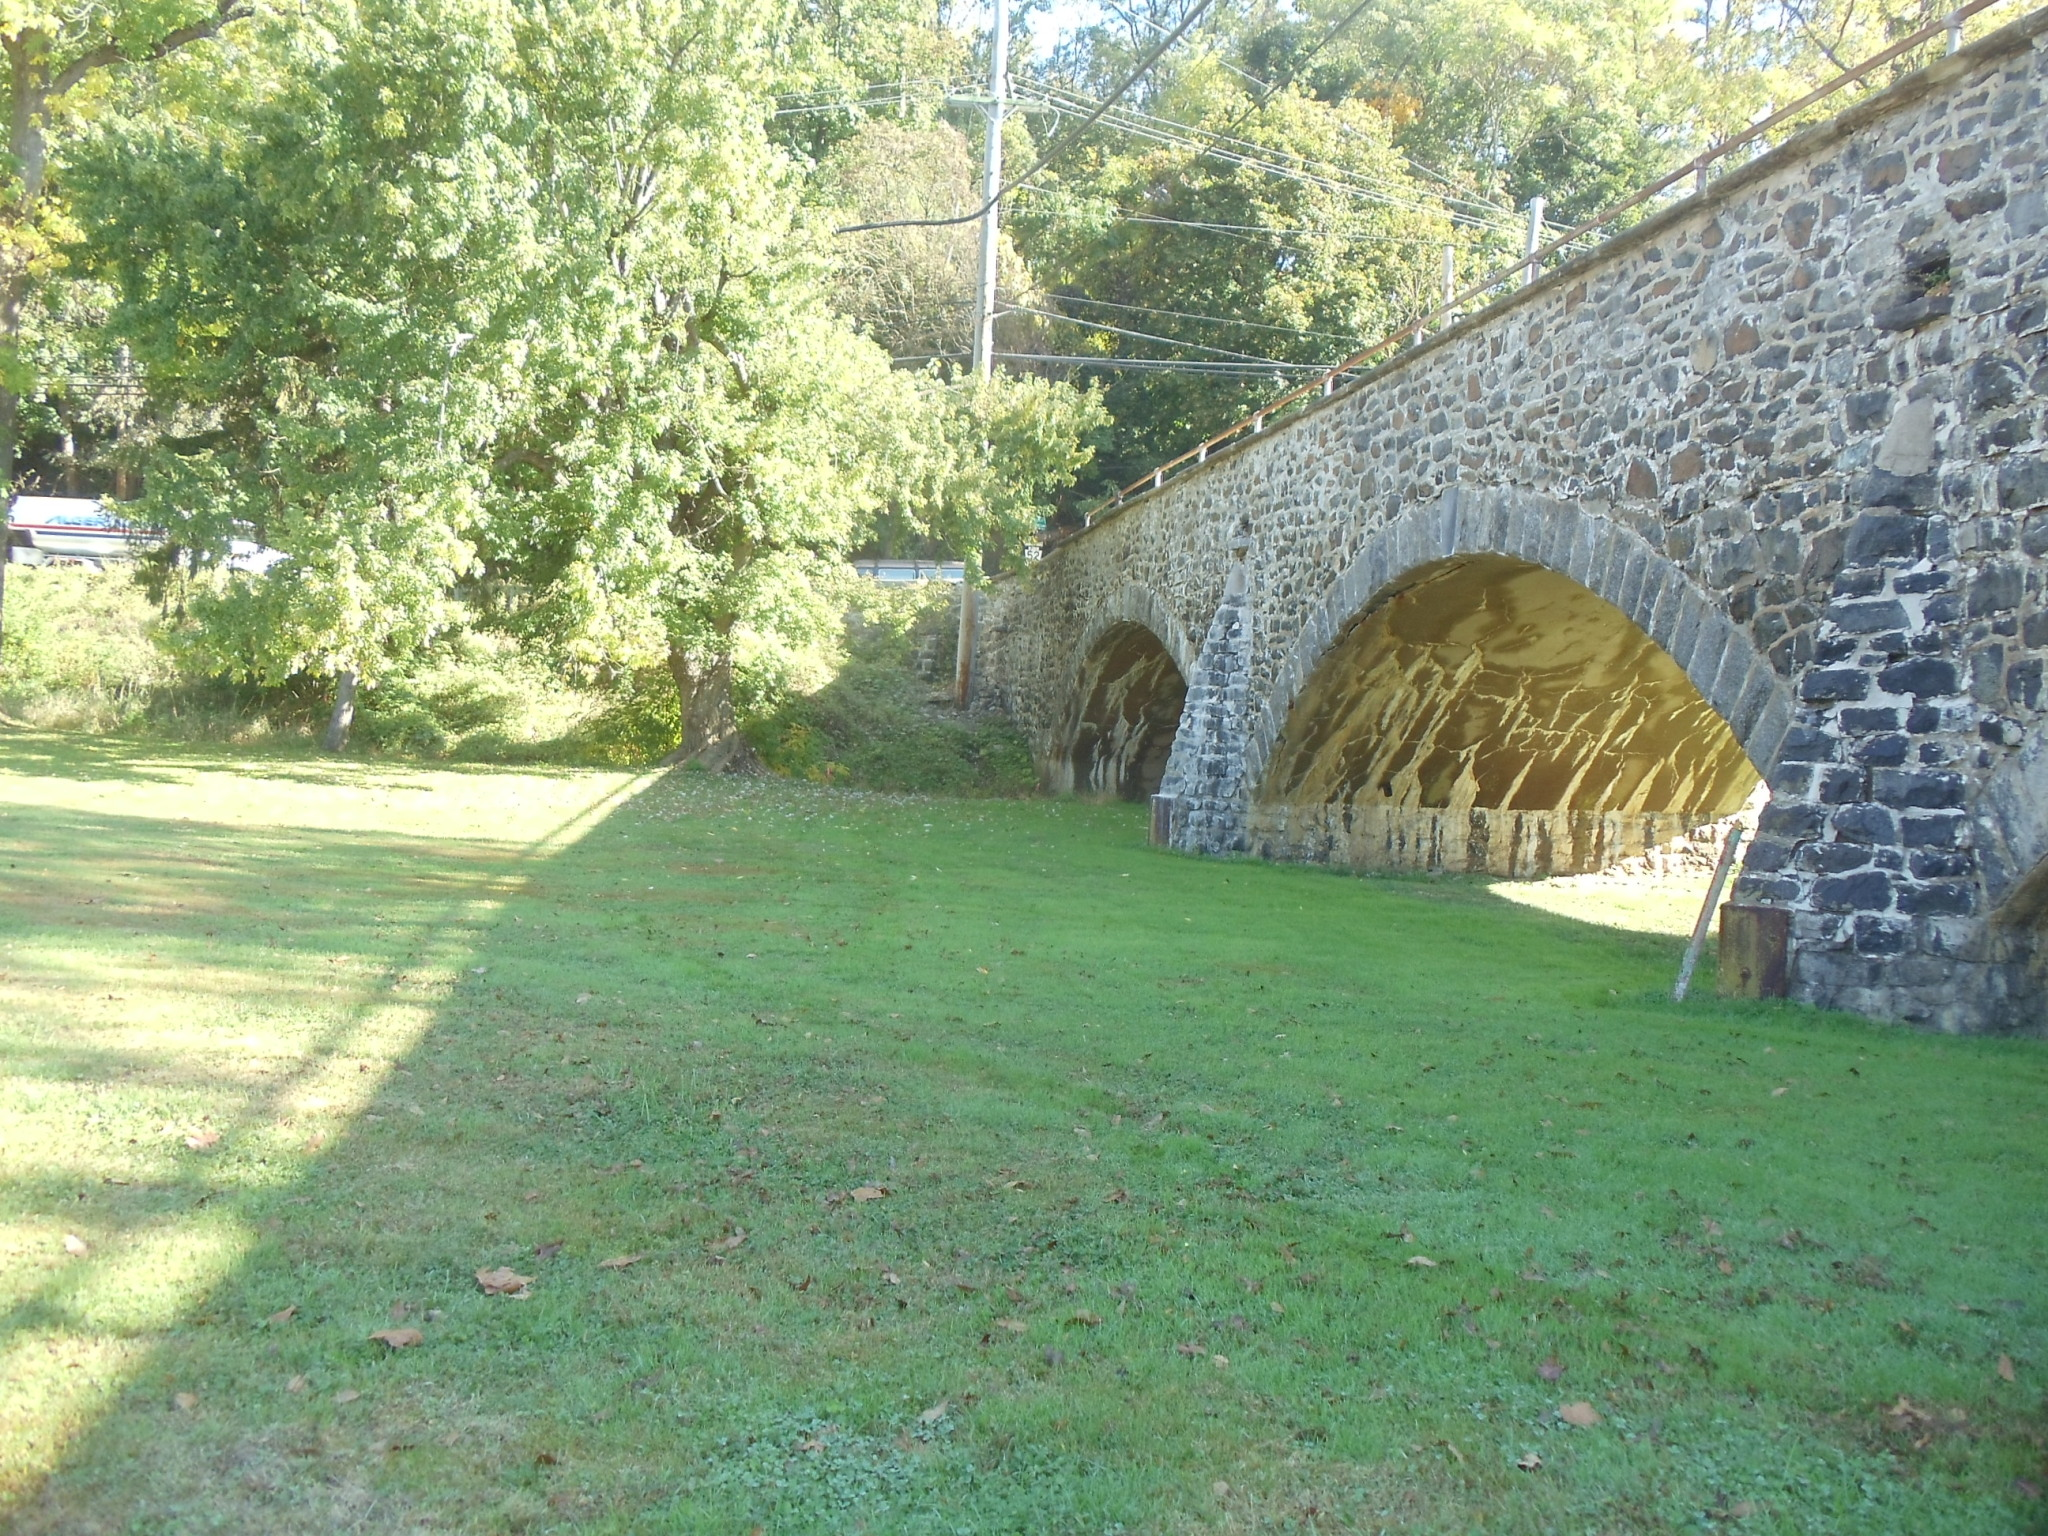 The Lenape Road bridge